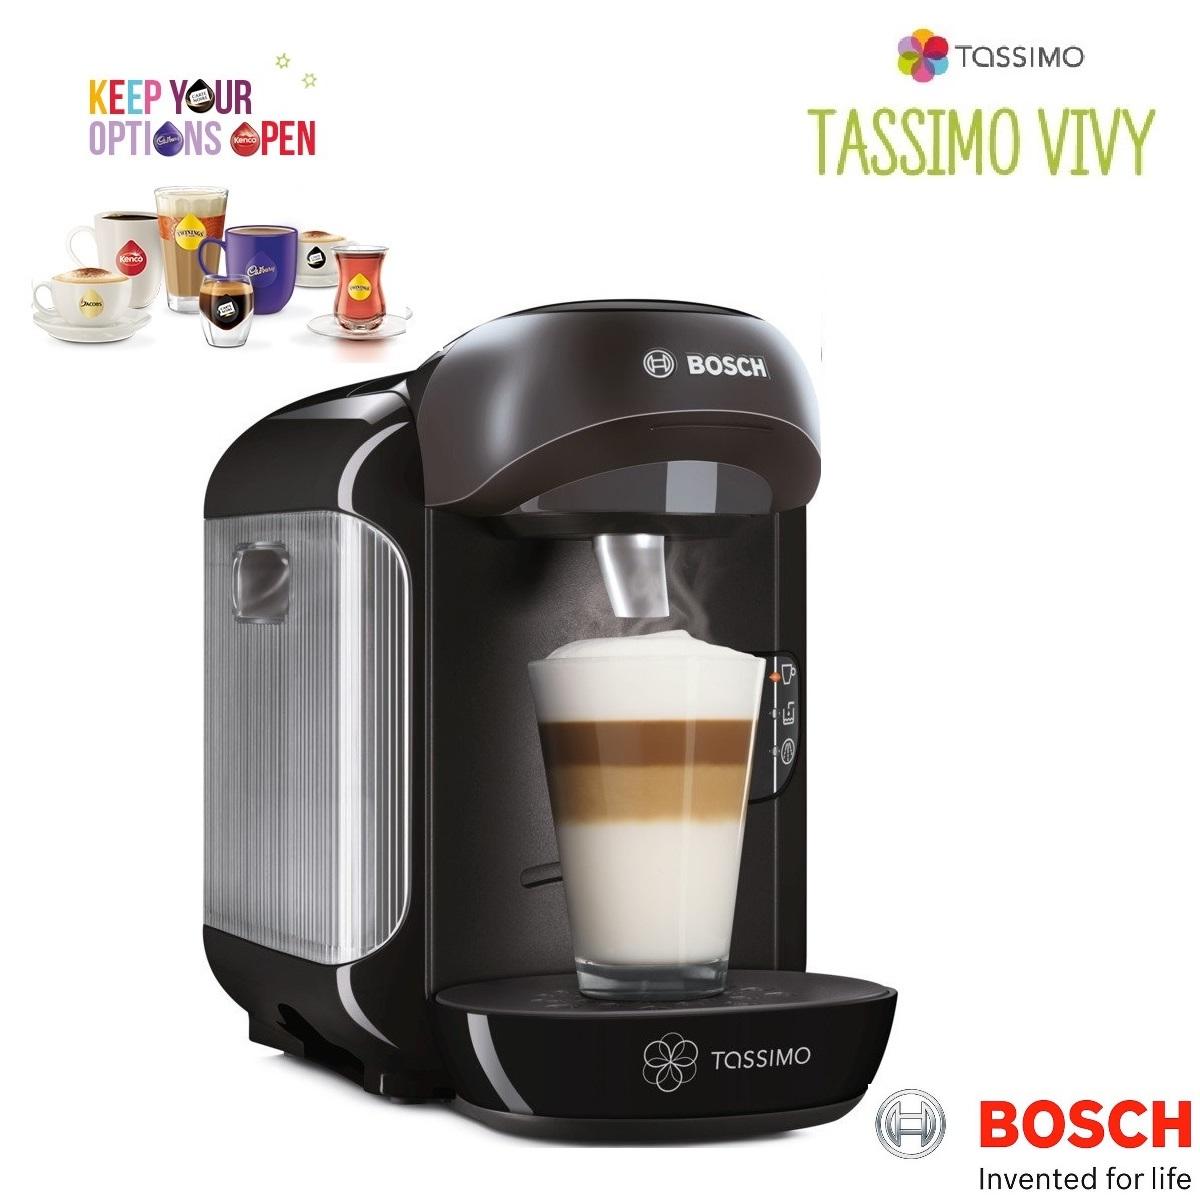 Bosch Coffee Maker Problems : Bosch Tassimo Vivy II T12 TAS1252GB Refurbished Offers